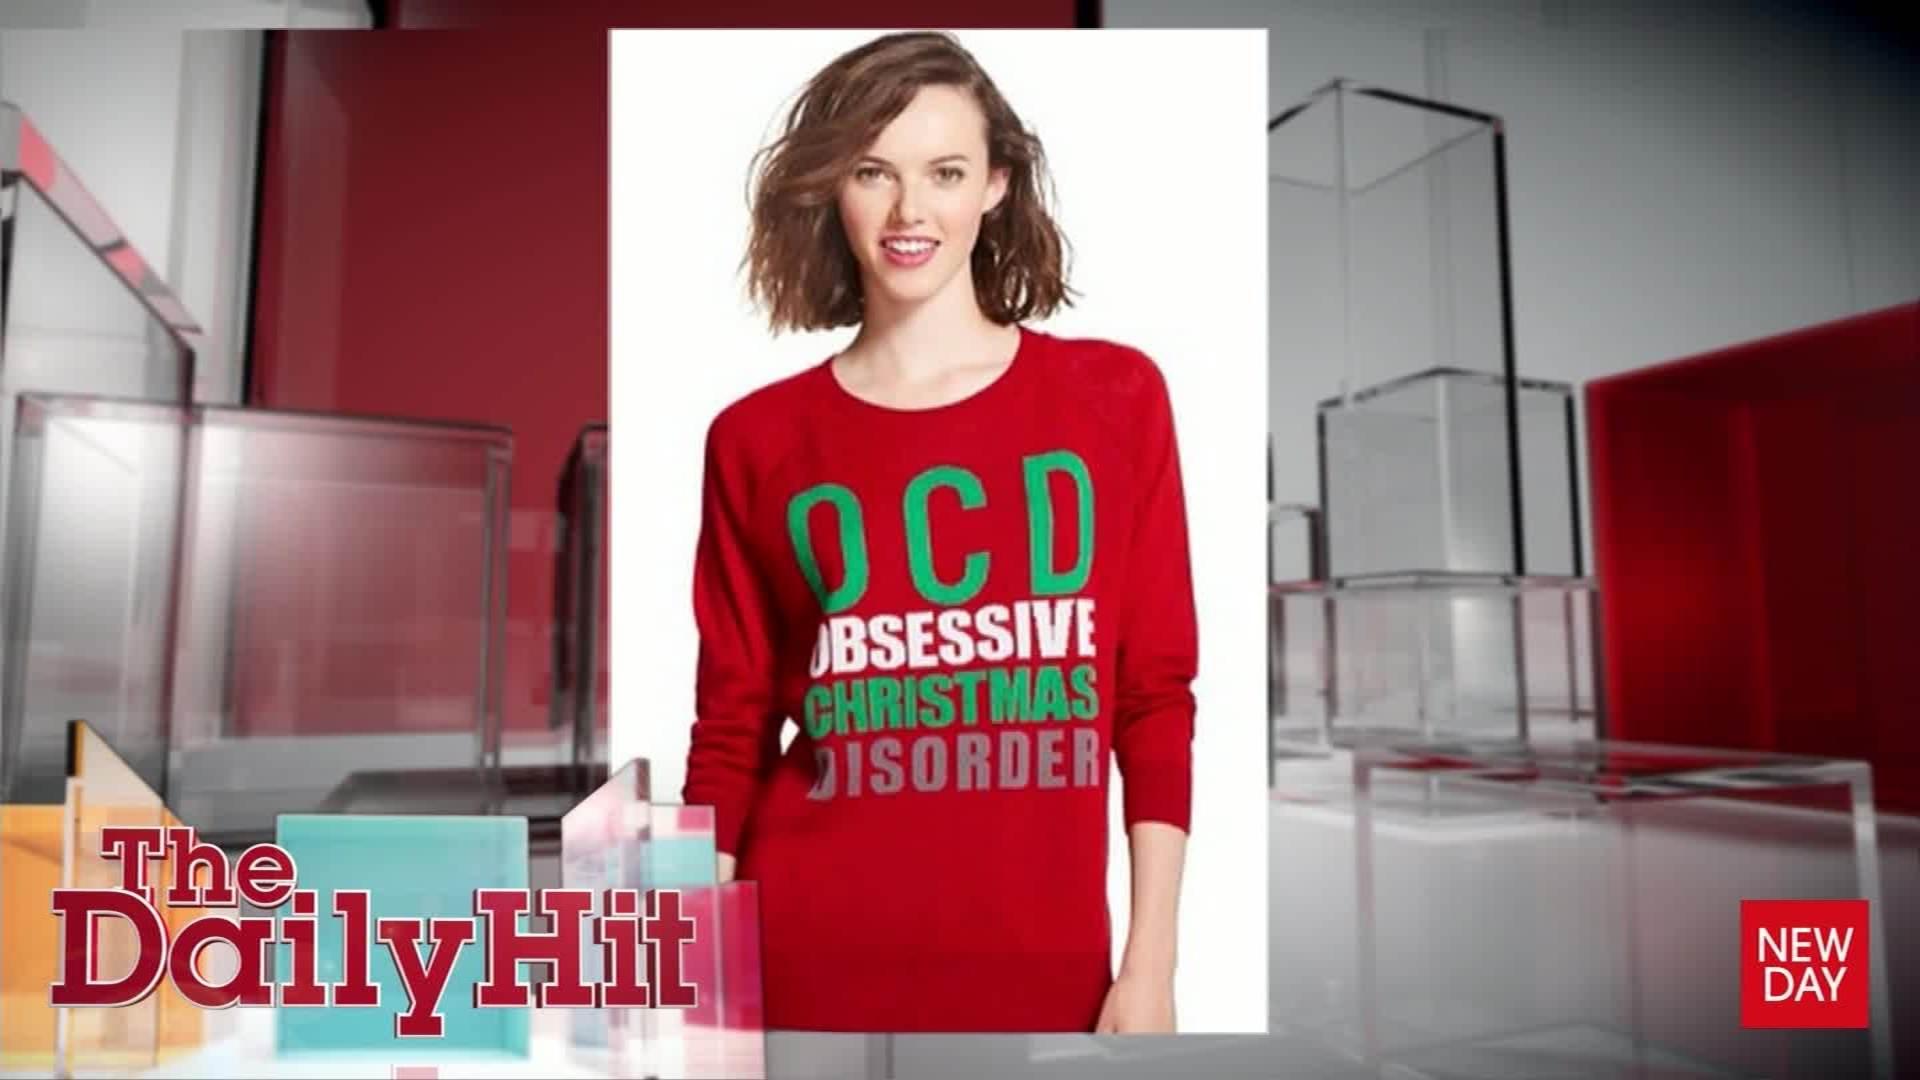 Target facing backlash over \'OCD\' sweater - CNN Video